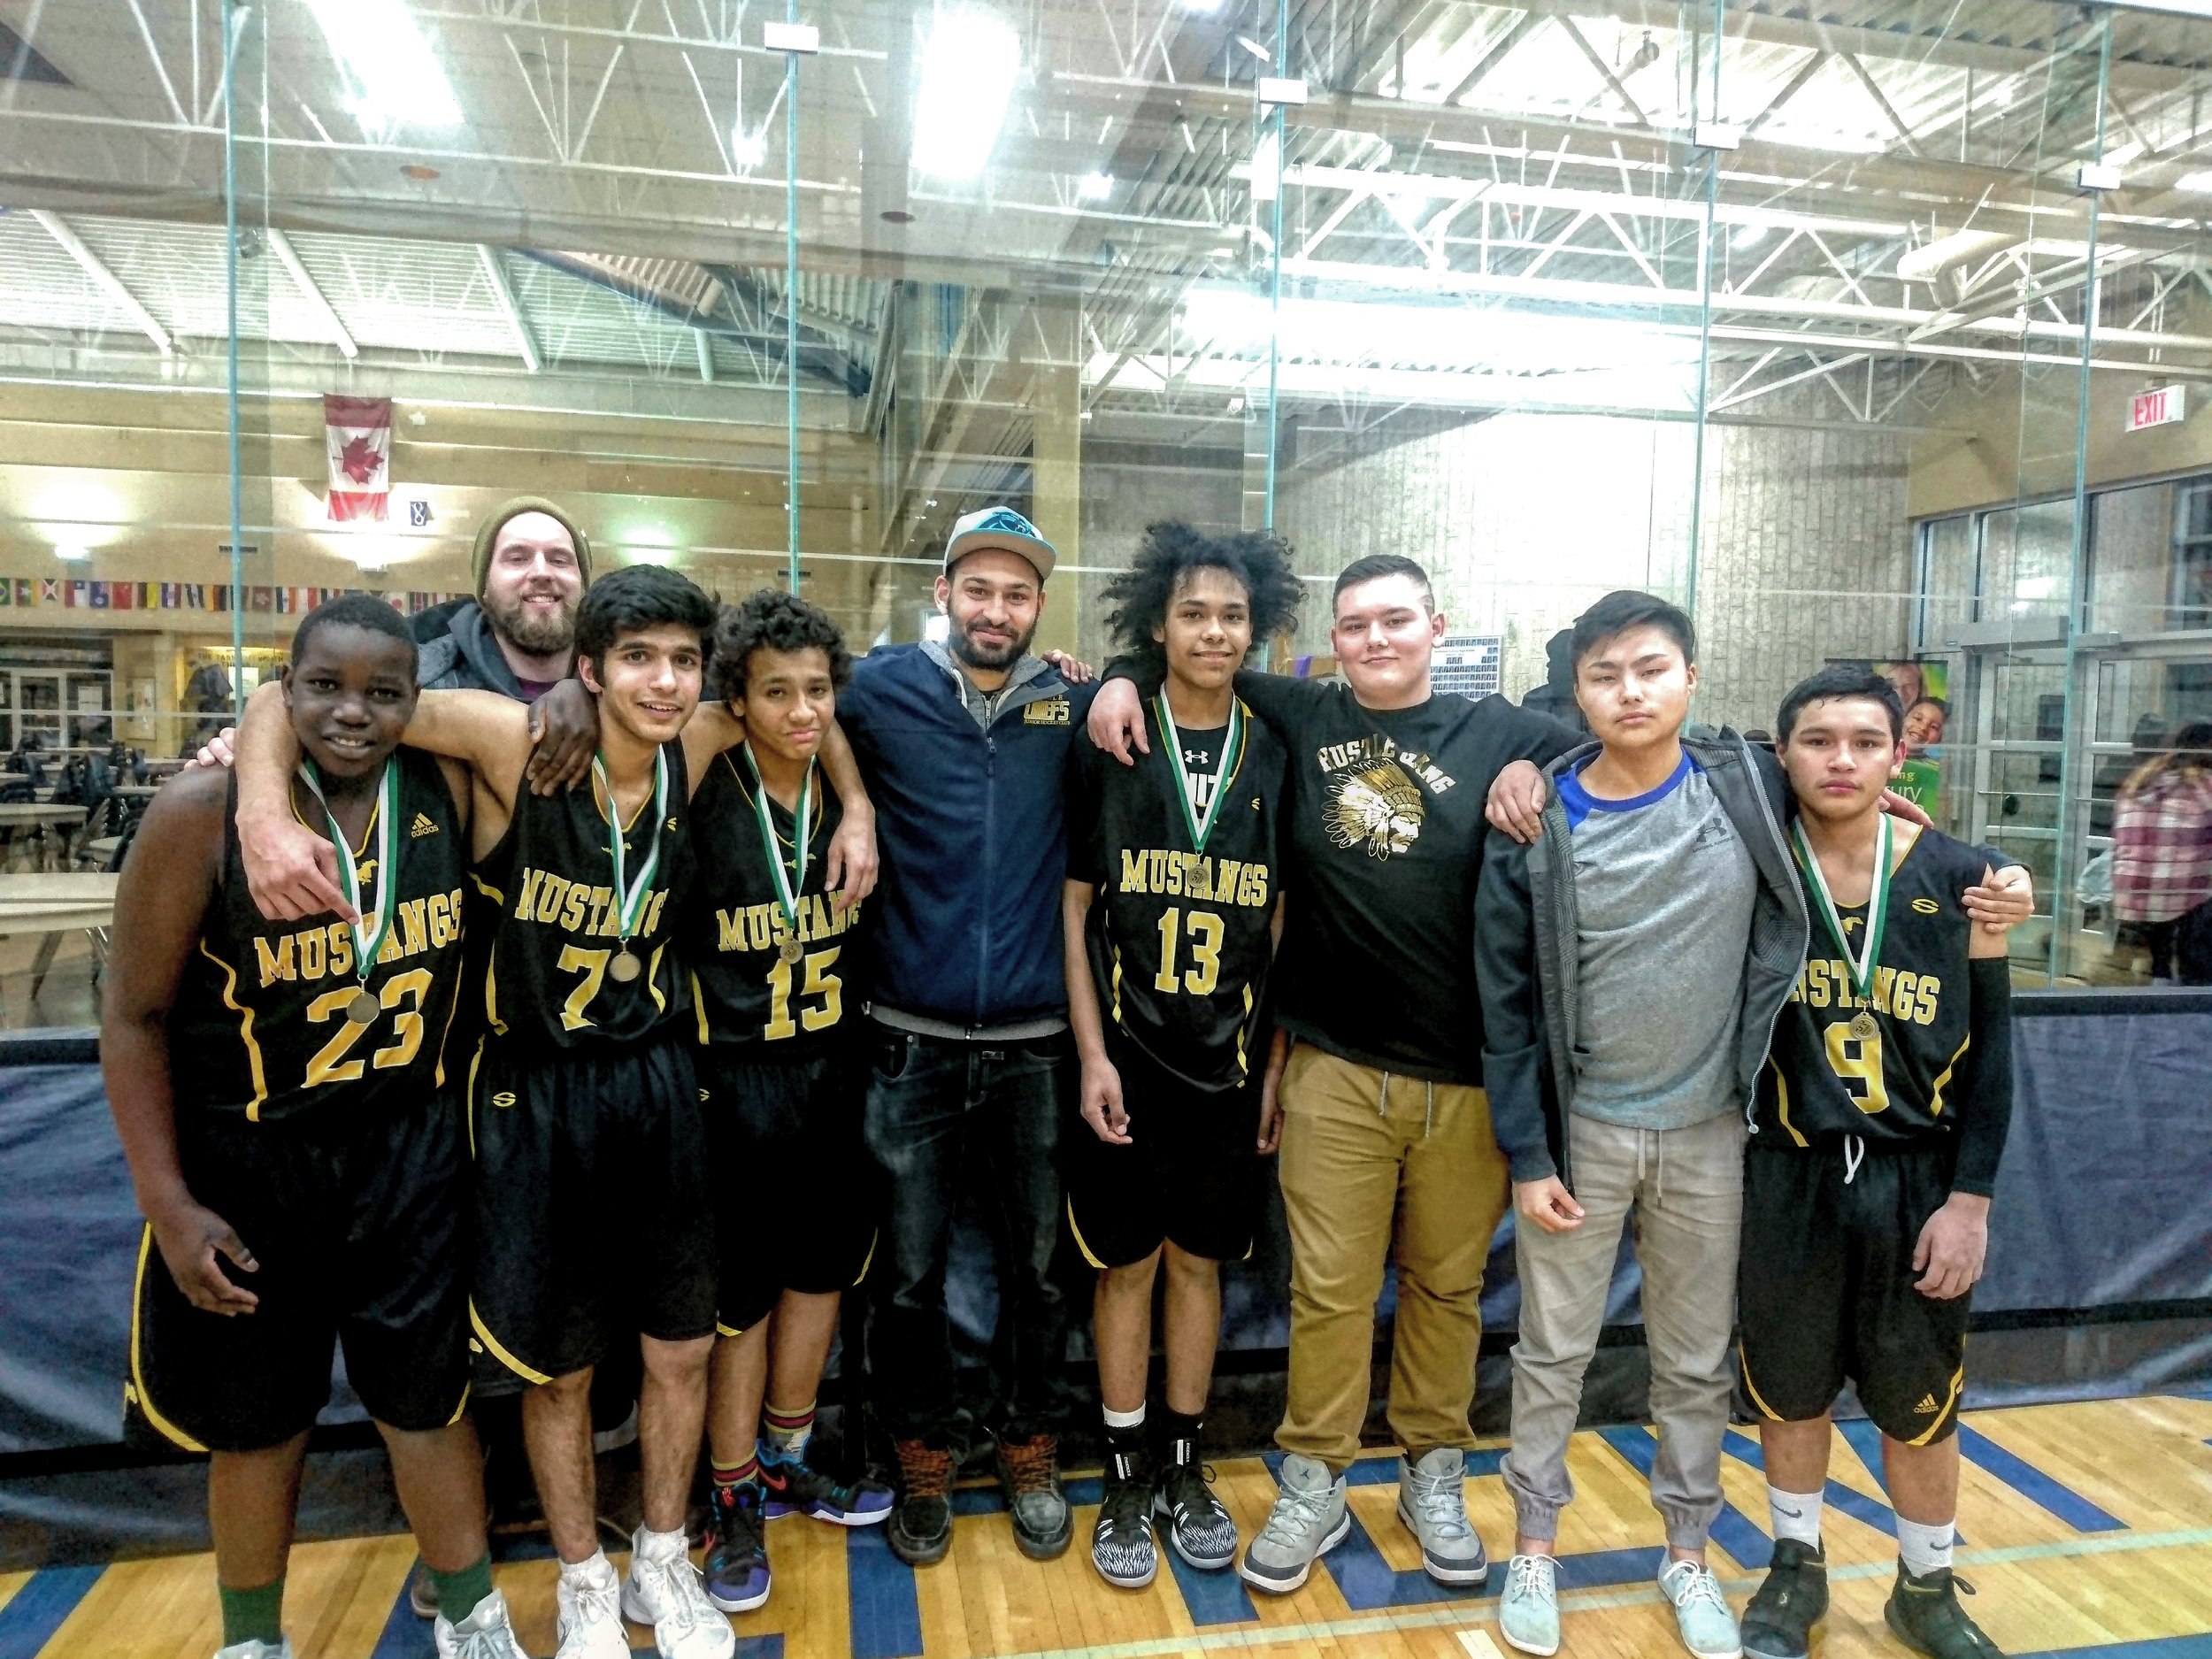 Last year's team, they won the junior city championship!